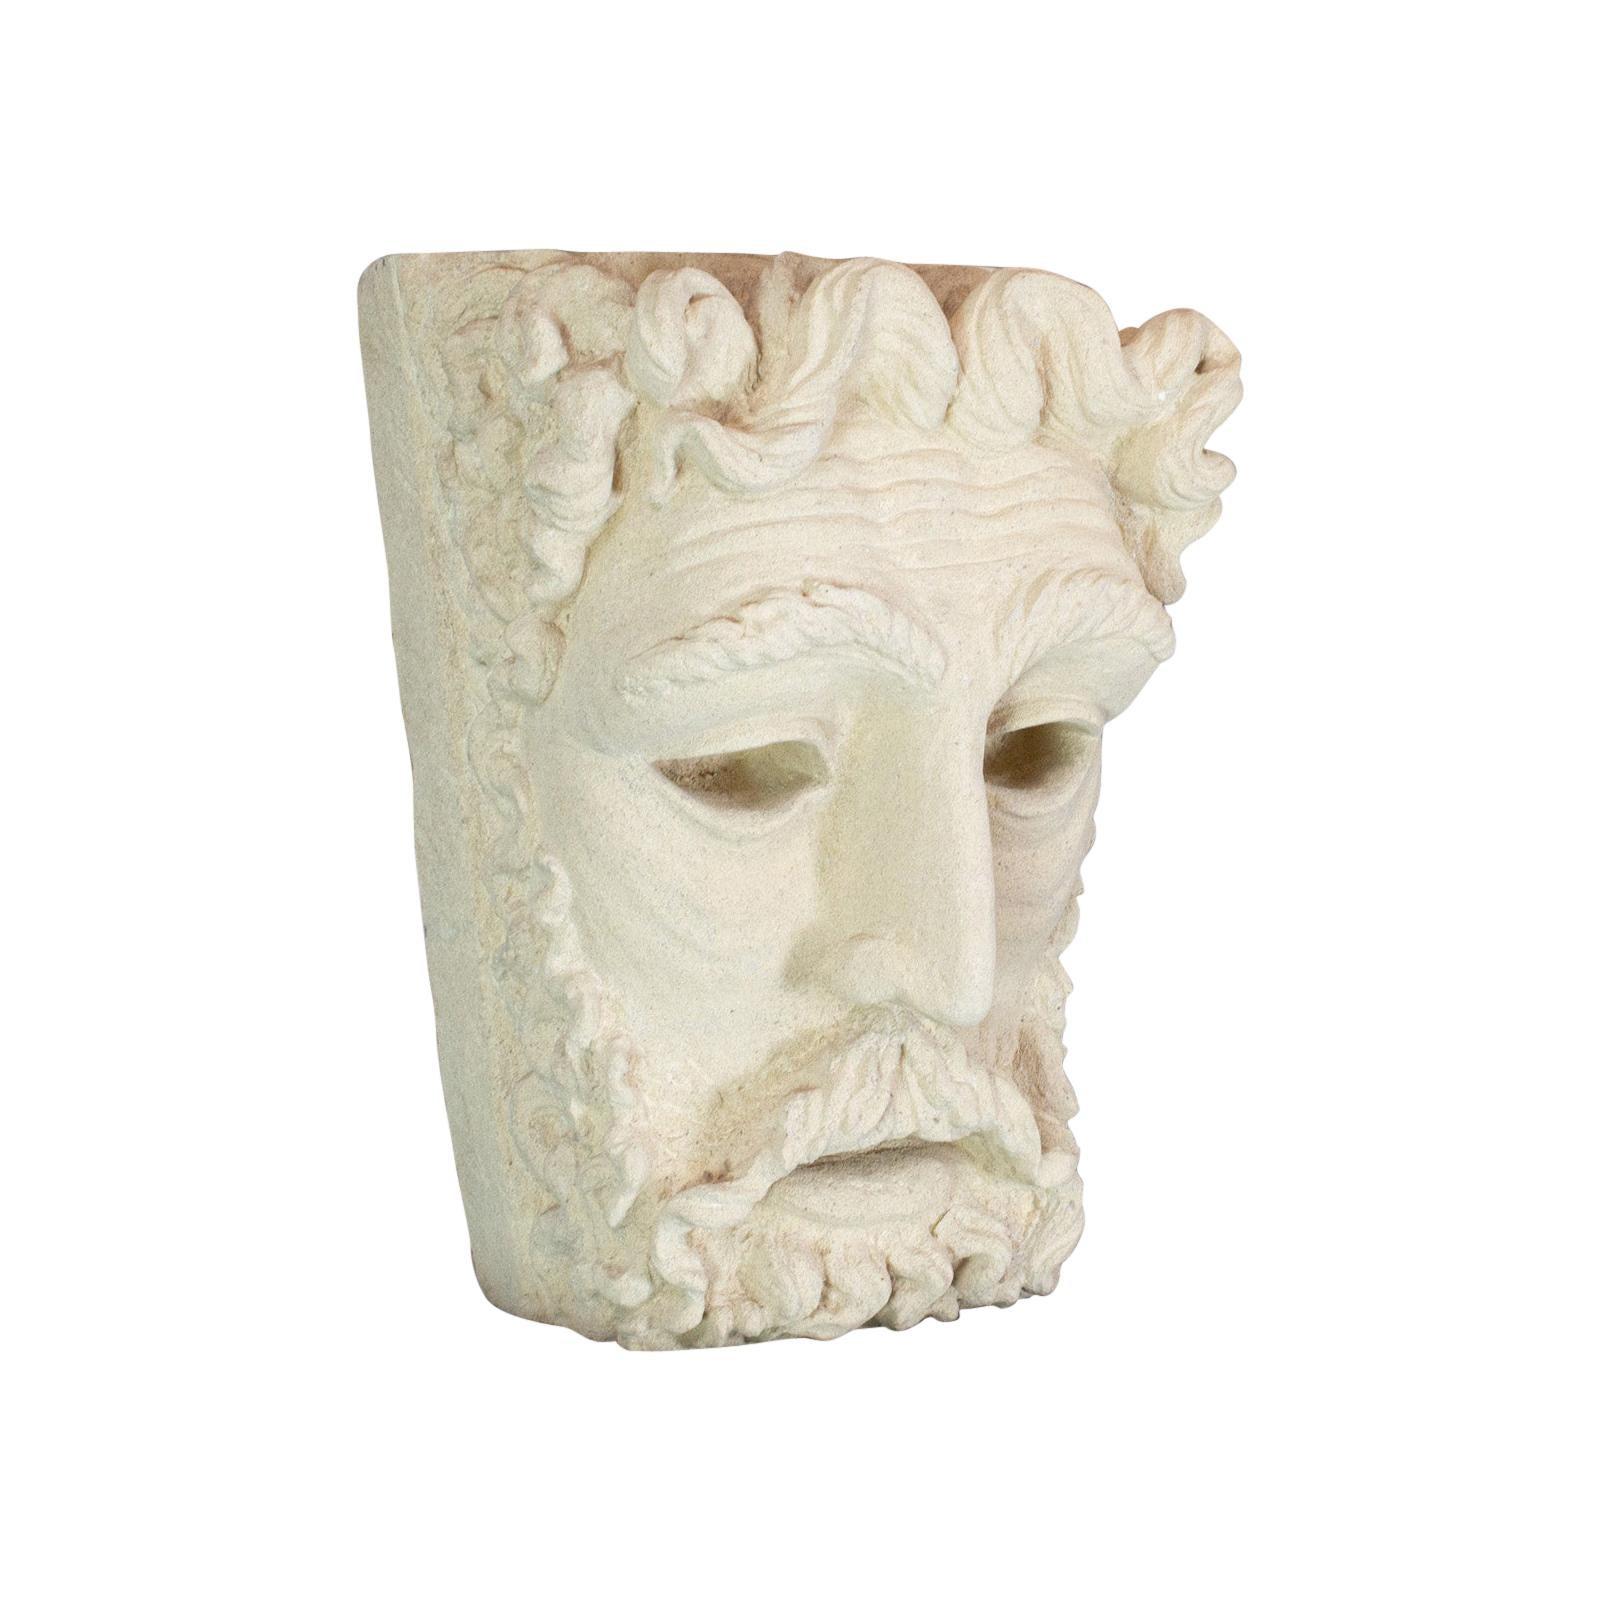 Vintage Sculpture, Poseidon, Dominic Hurley, English, Bath Stone, Greek God